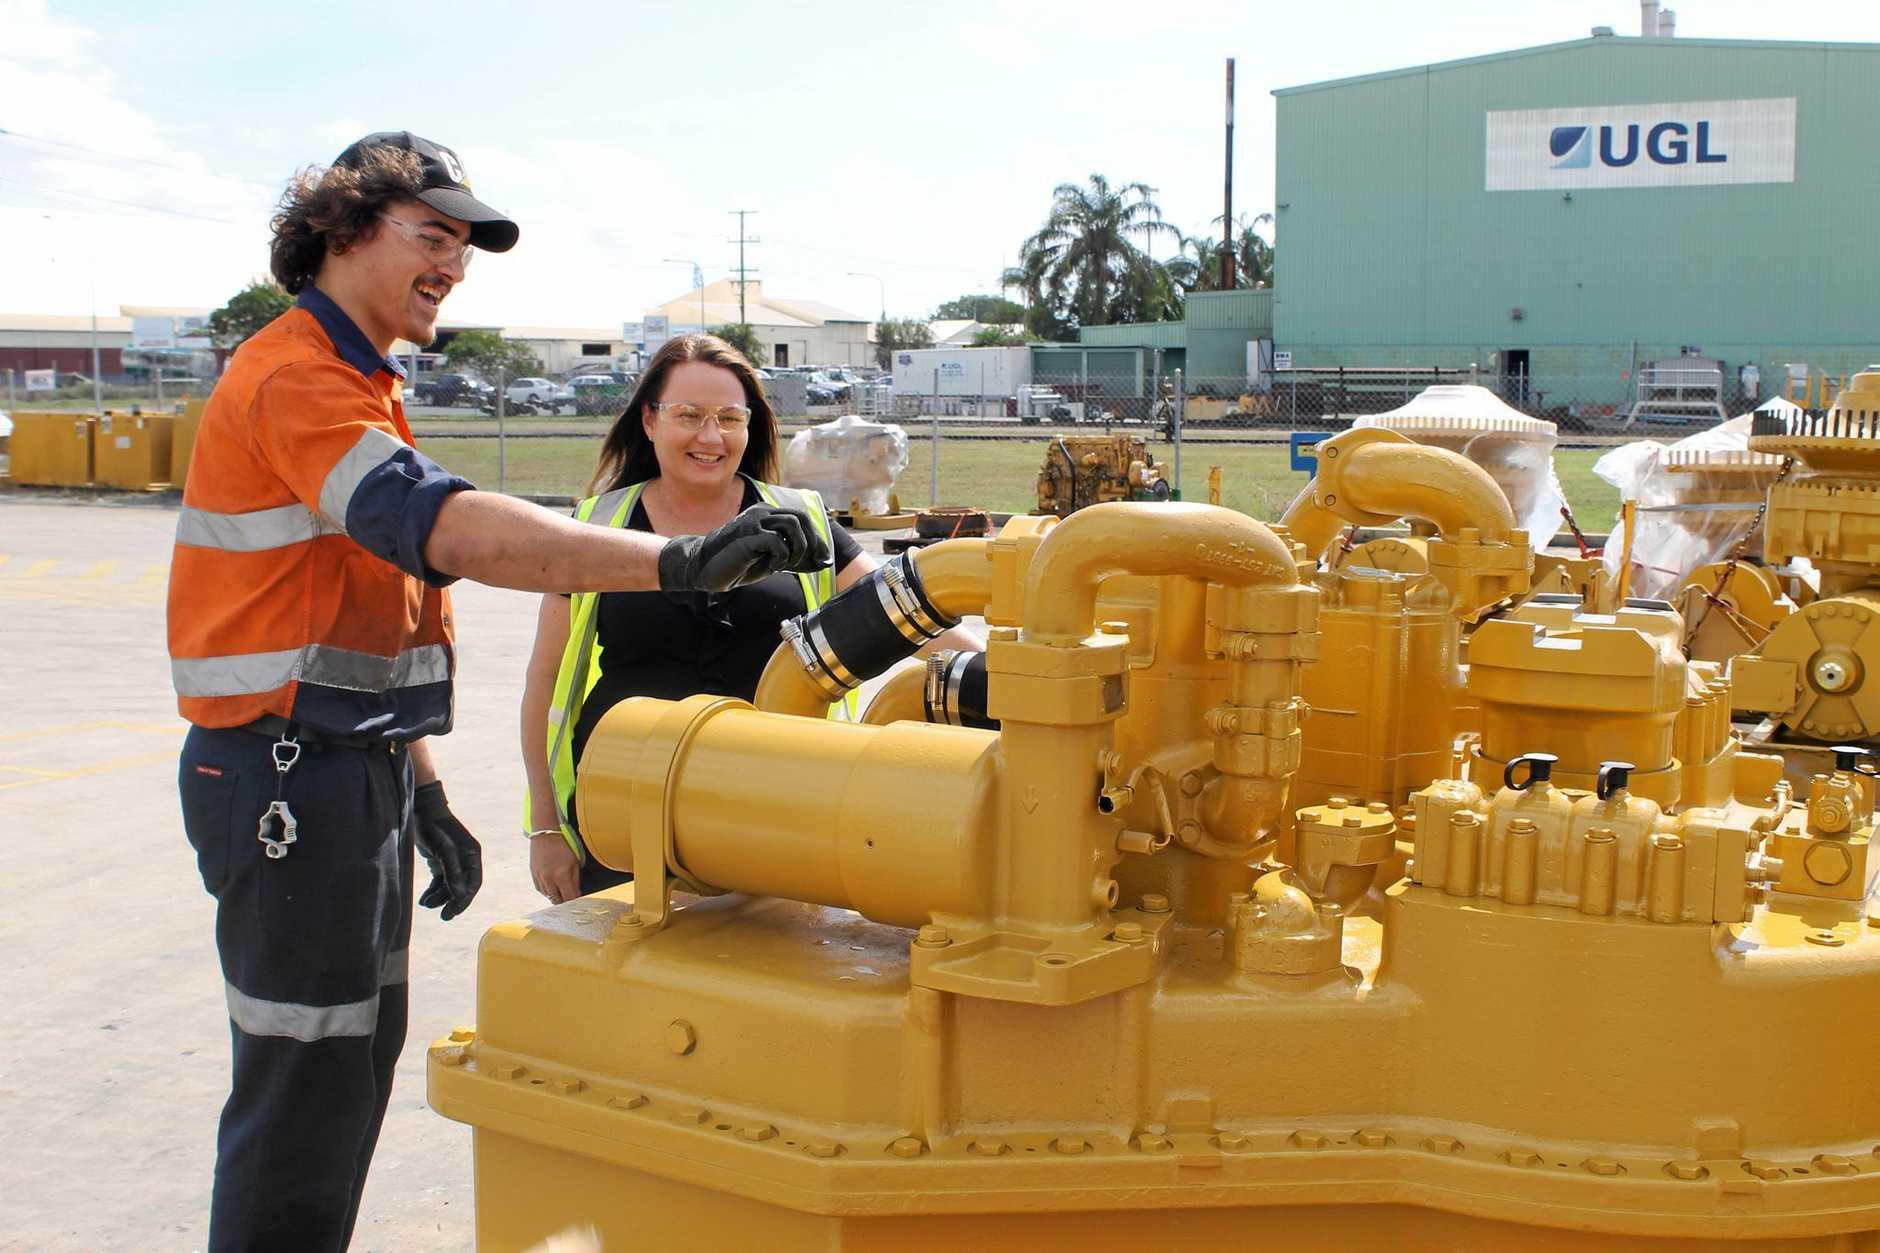 Diesel Fitter apprentice Will Lansbury with Hastings Deering Apprenticeships Coordinator Kristina Riemer.